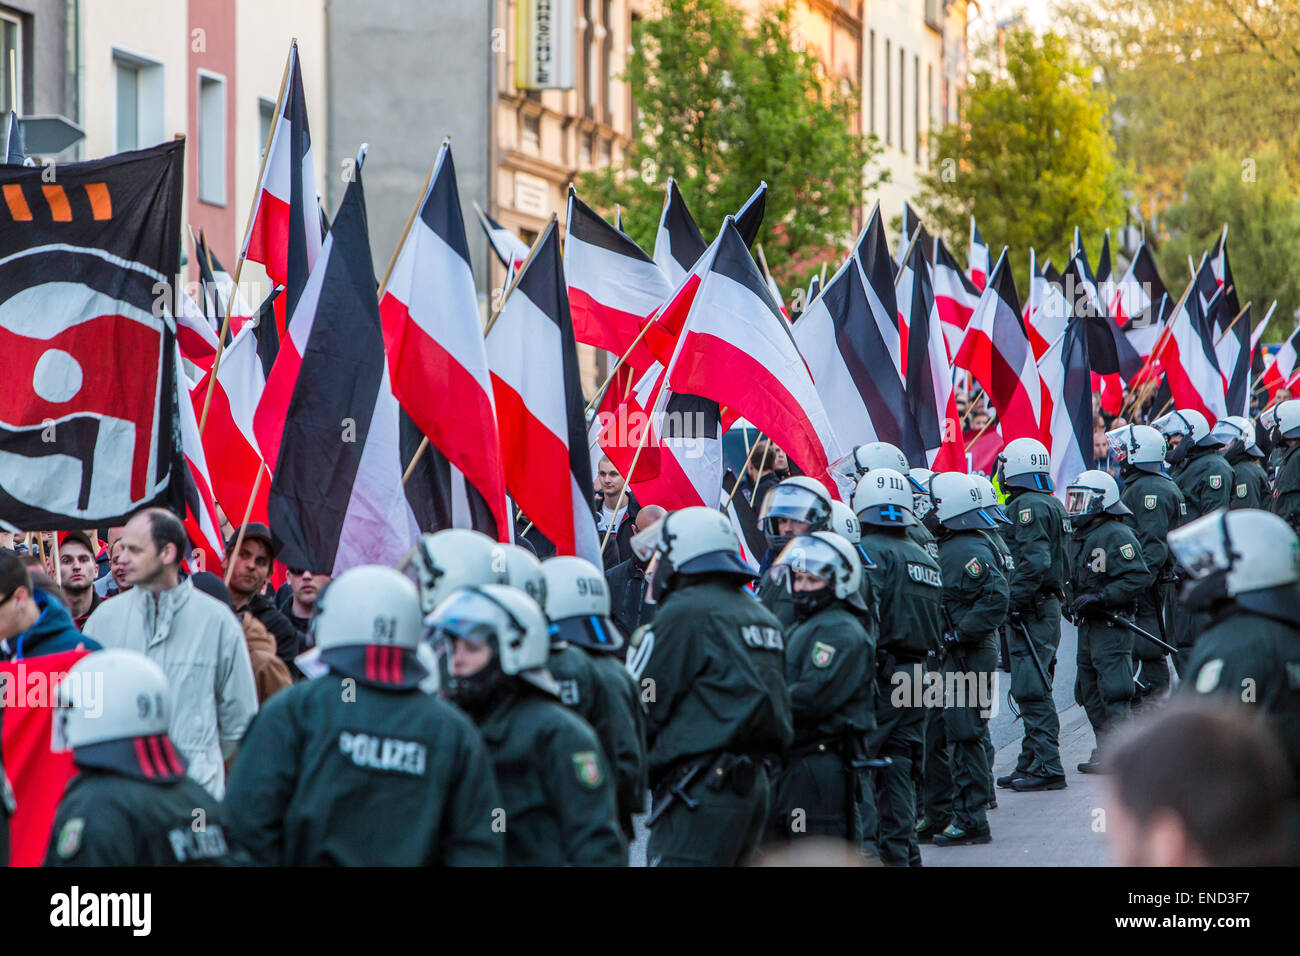 Neo Nazis Stockfotos & Neo Nazis Bilder - Alamy